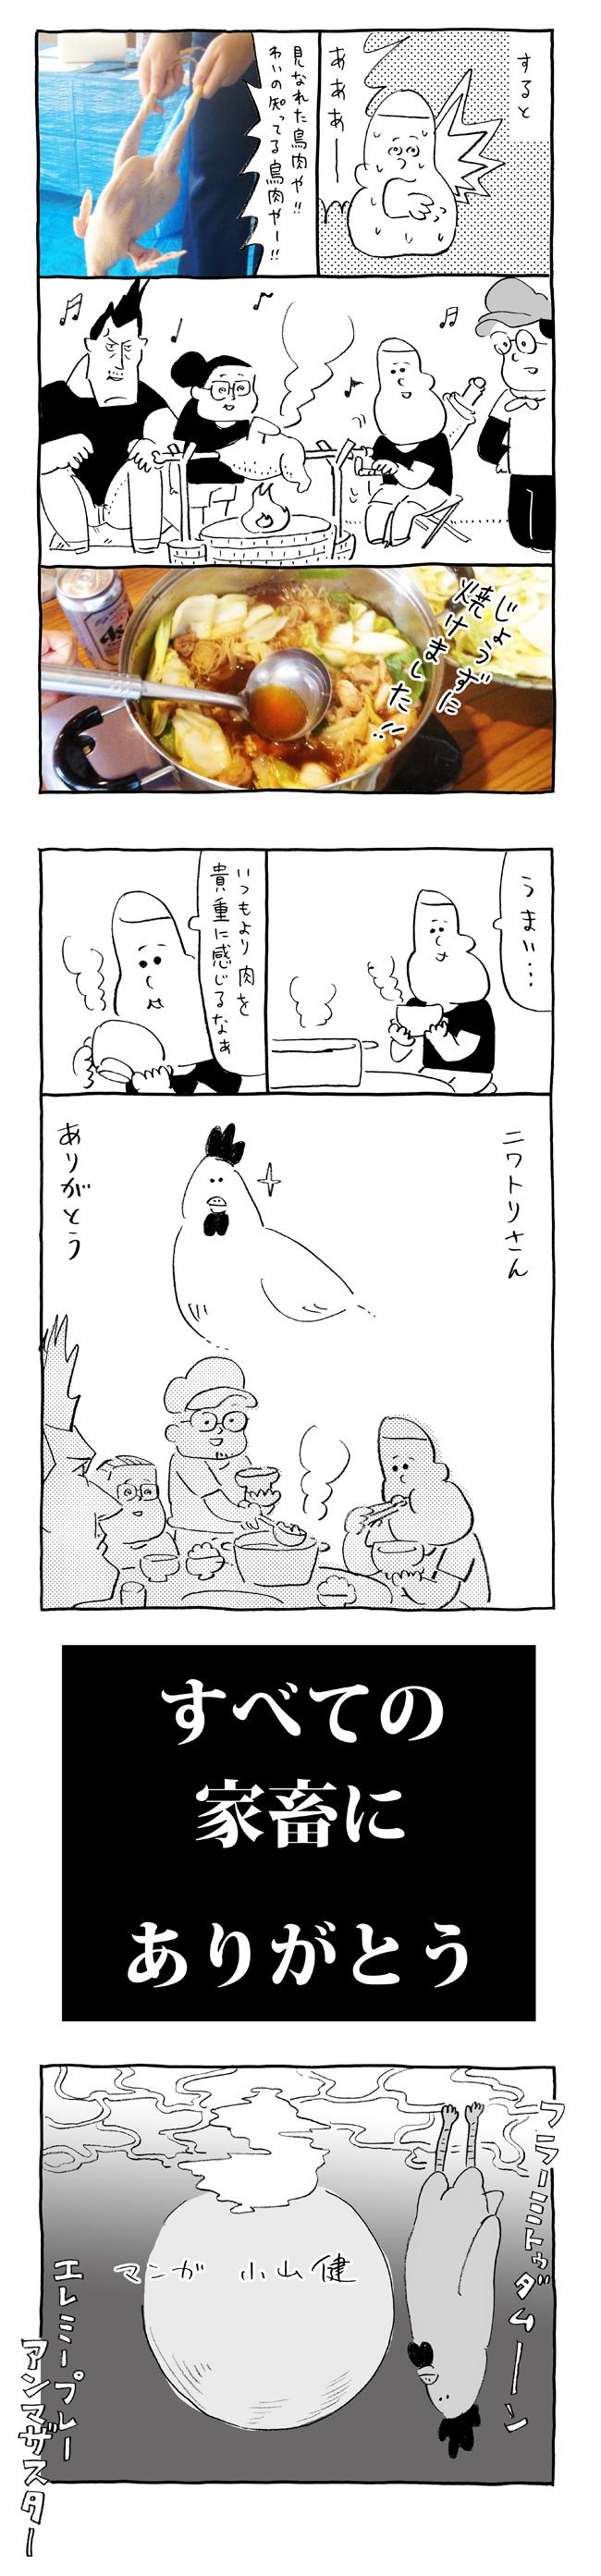 omocoro_p04_ol